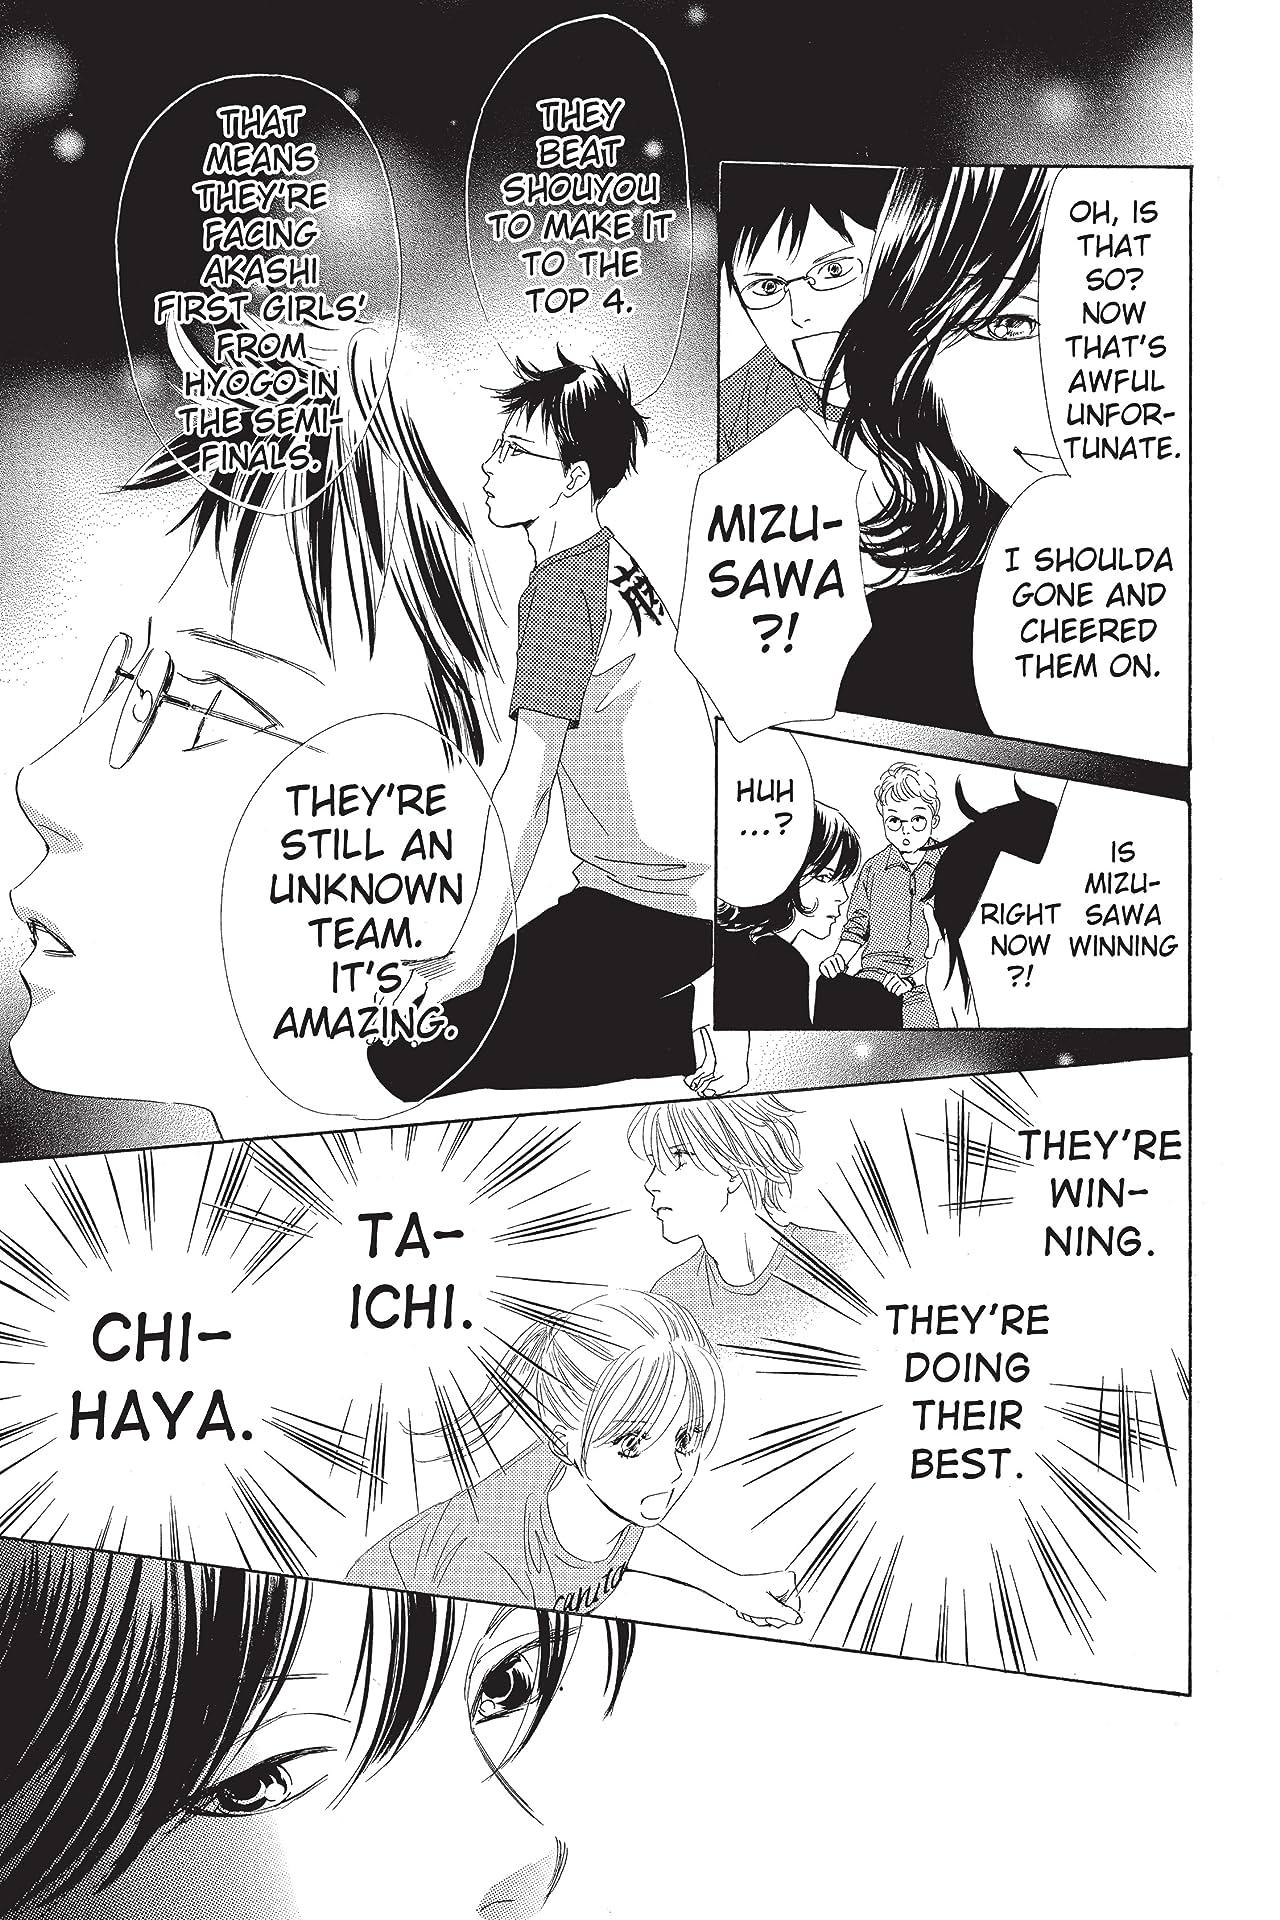 Chihayafuru Vol. 14